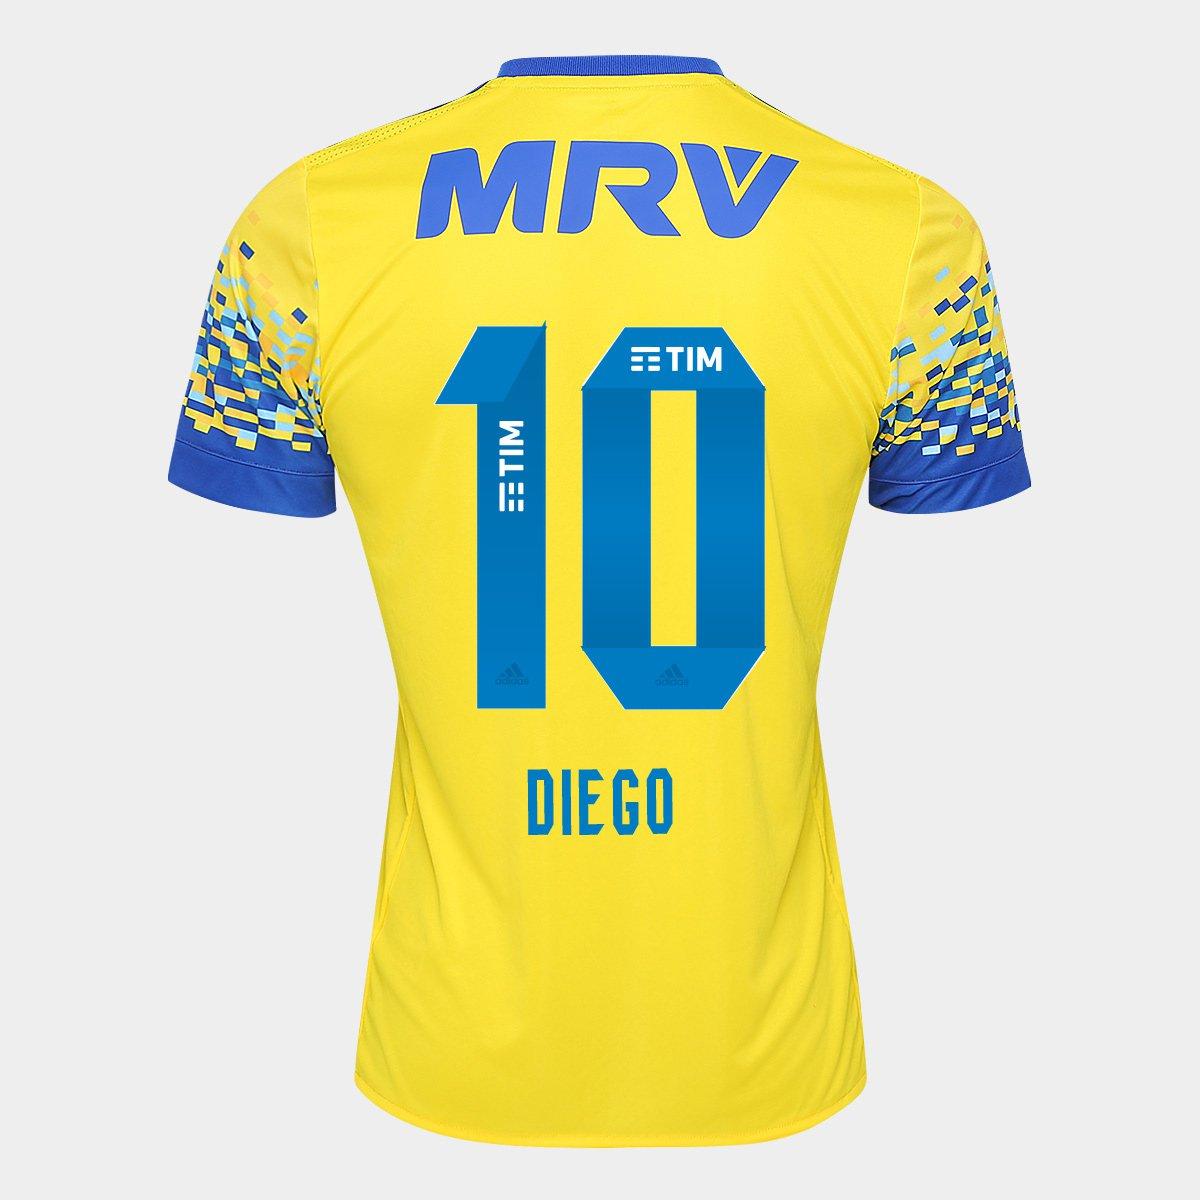 Camisa Flamengo III 17 18 N° 10 - Diego Torcedor Adidas Masculina - Compre  Agora  bf9bc3e4b0f28